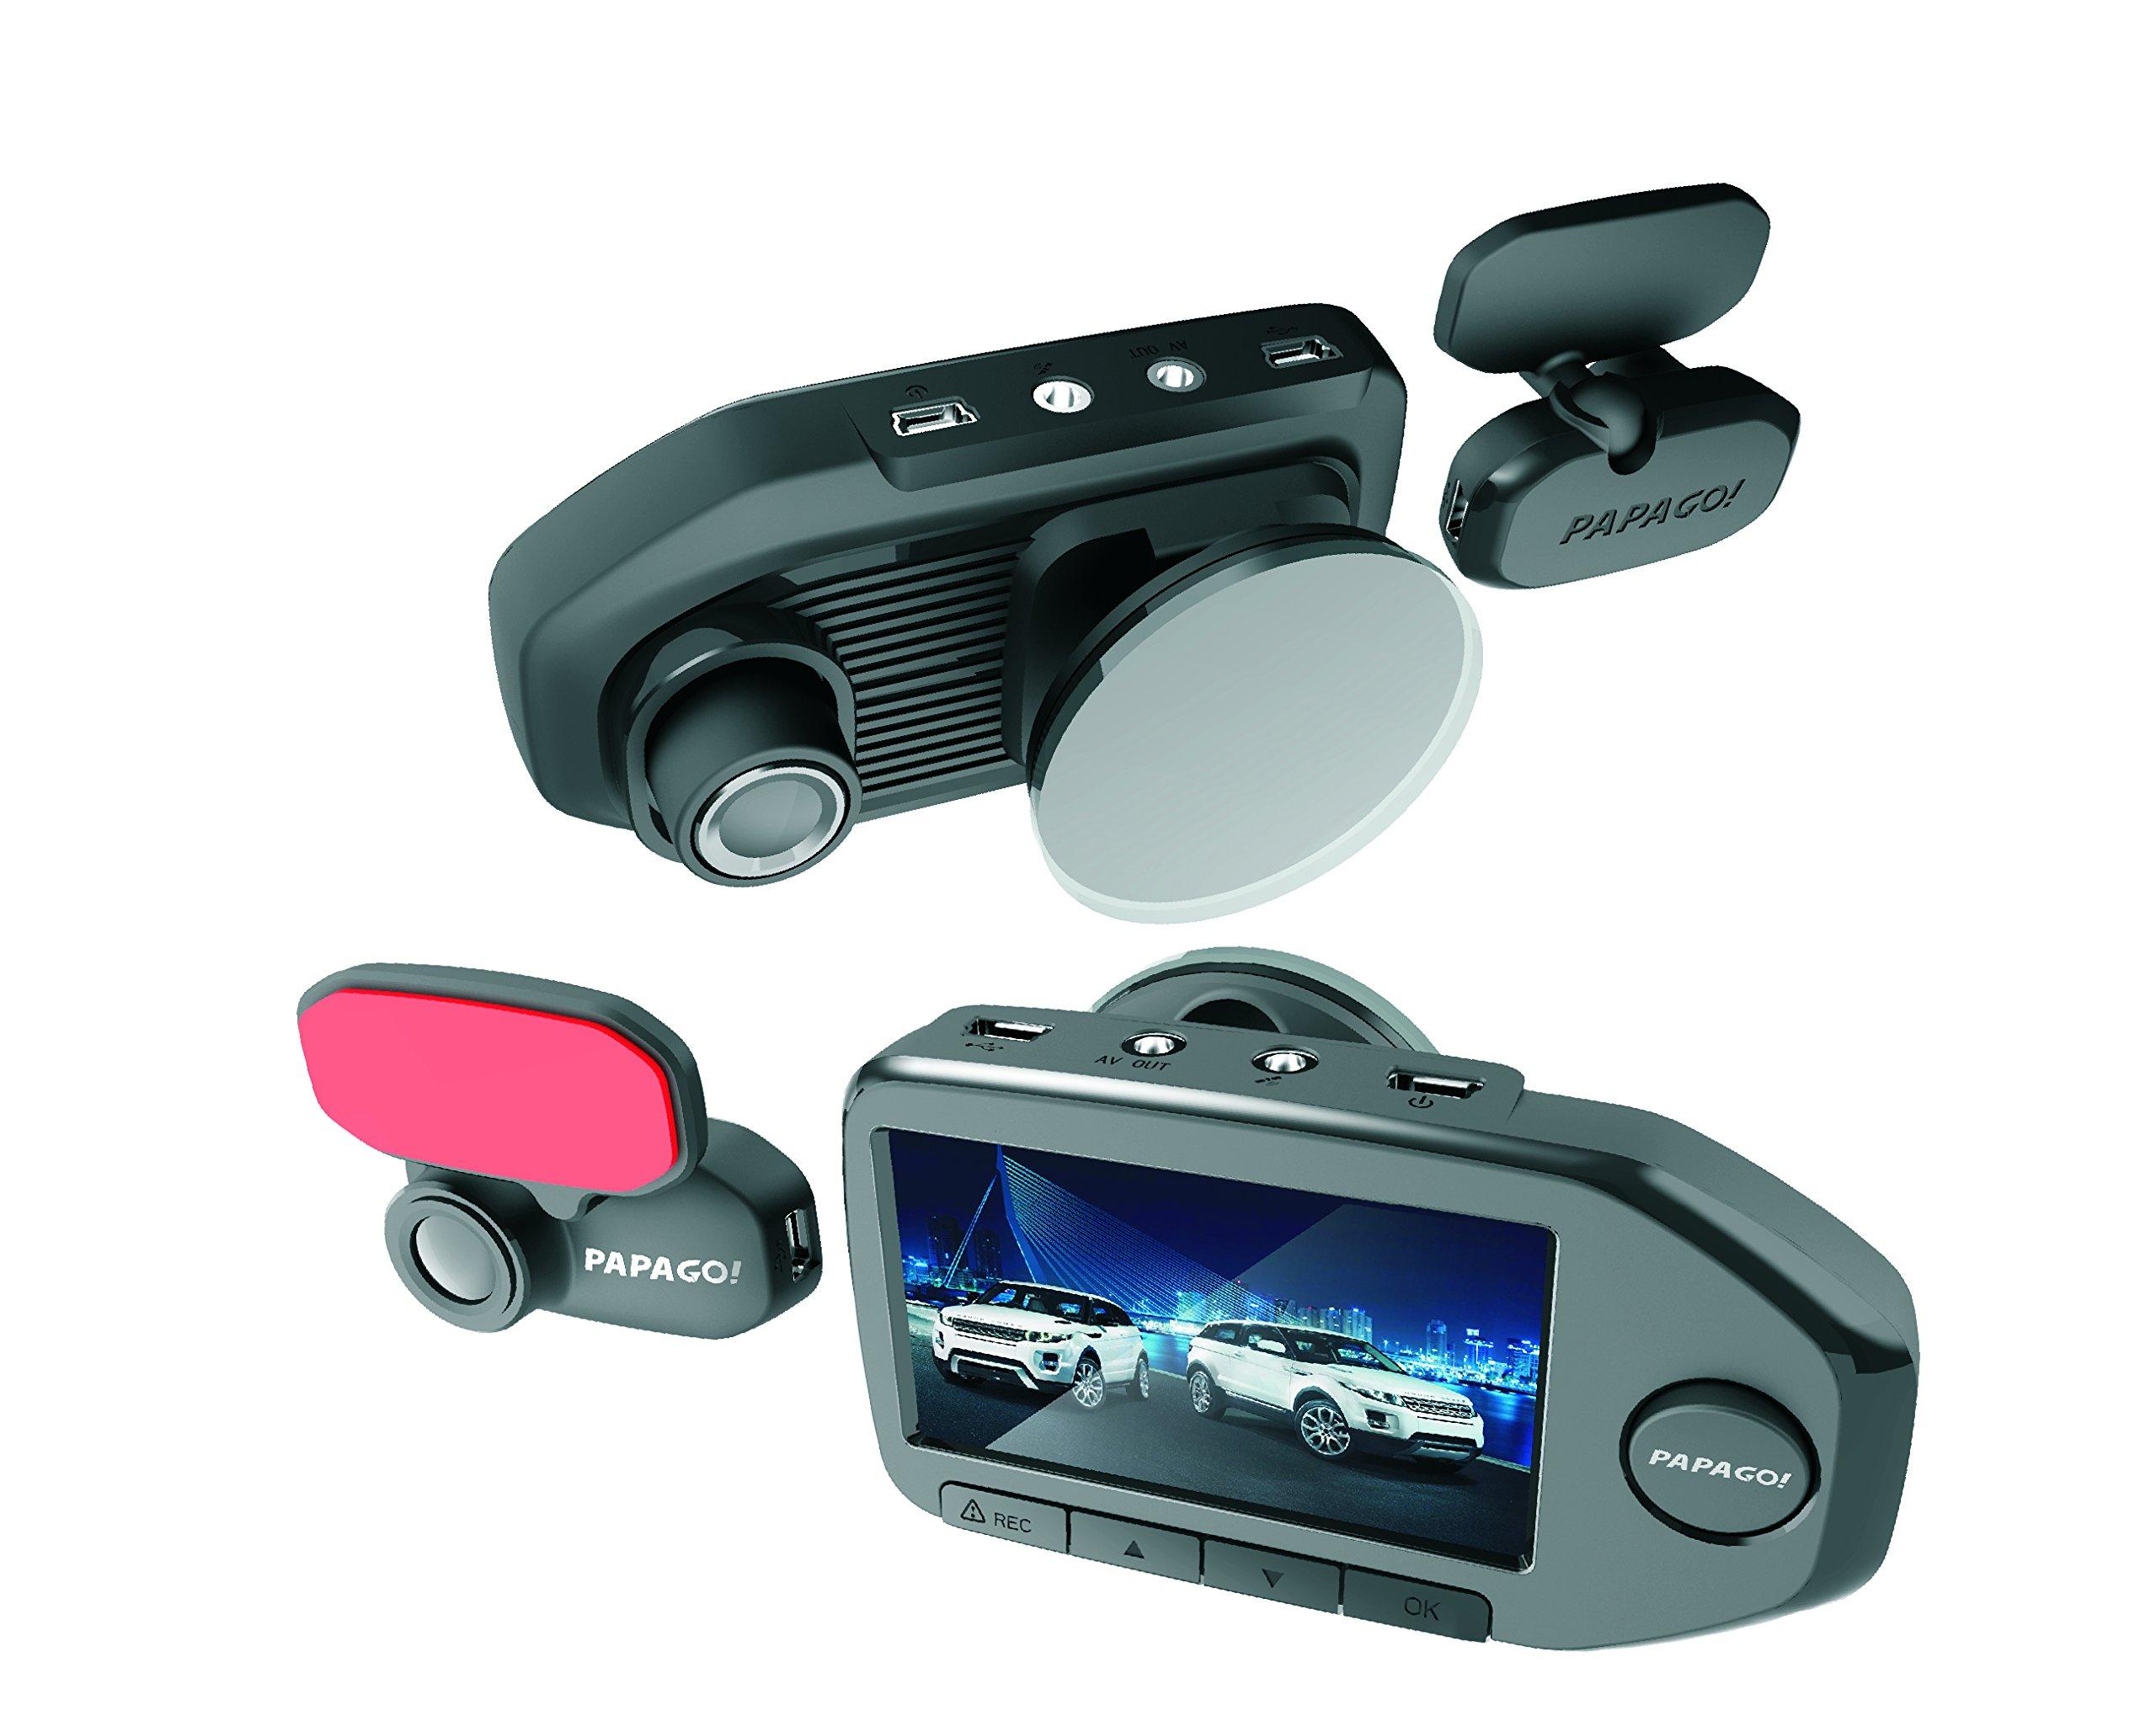 PAPAGO! Car Dash Camera GoSafe 760 Full HD Dual Channel Dash Cam 1080P Car DVR , Car Cam, Night Vision ,Backup Camera, Free 32GB Micro SD Card GS76032G